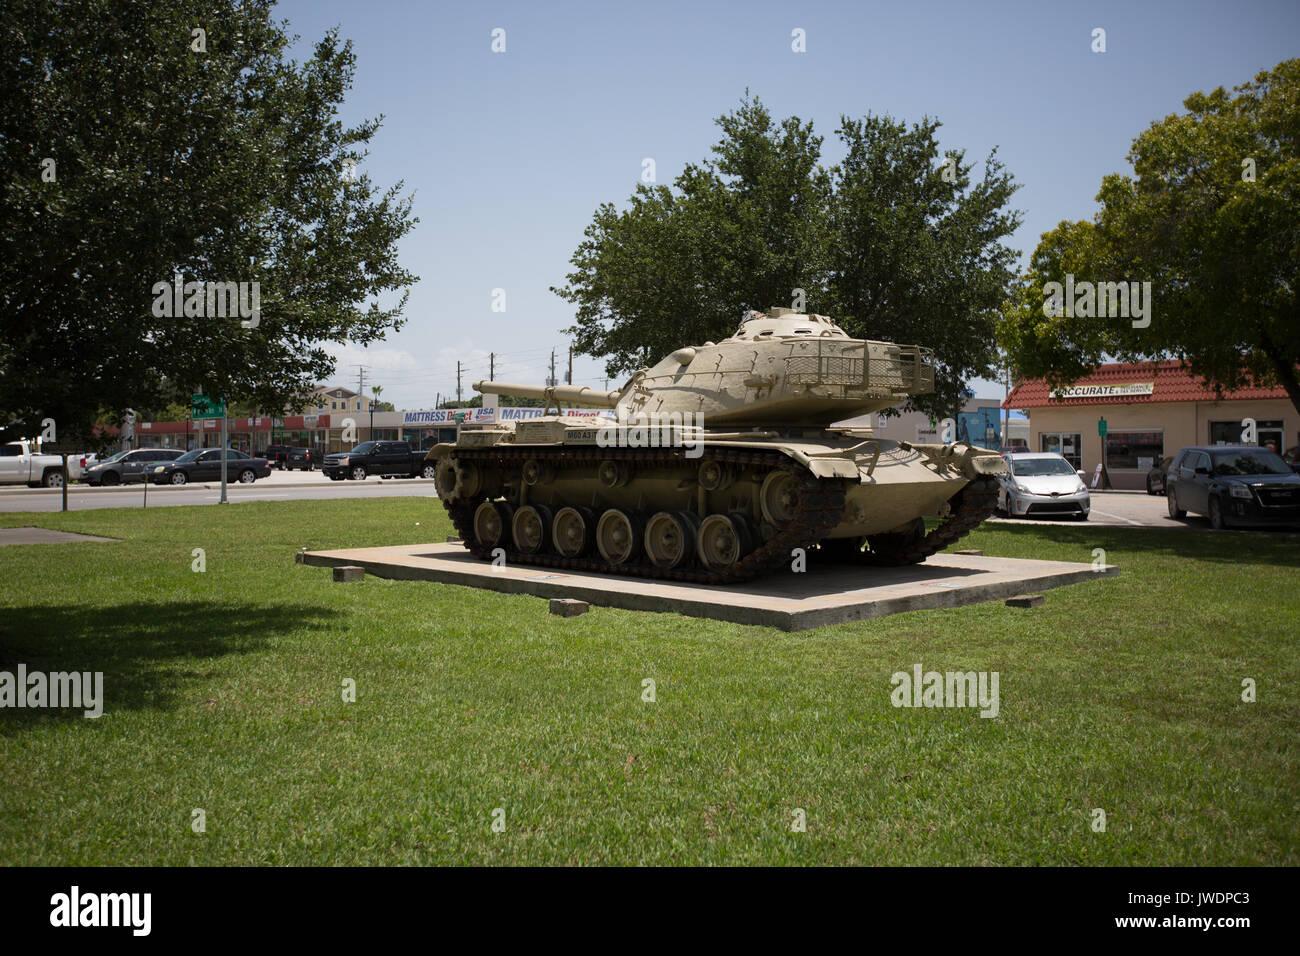 Old United States Army Tank at a war memoral display. Stock Photo